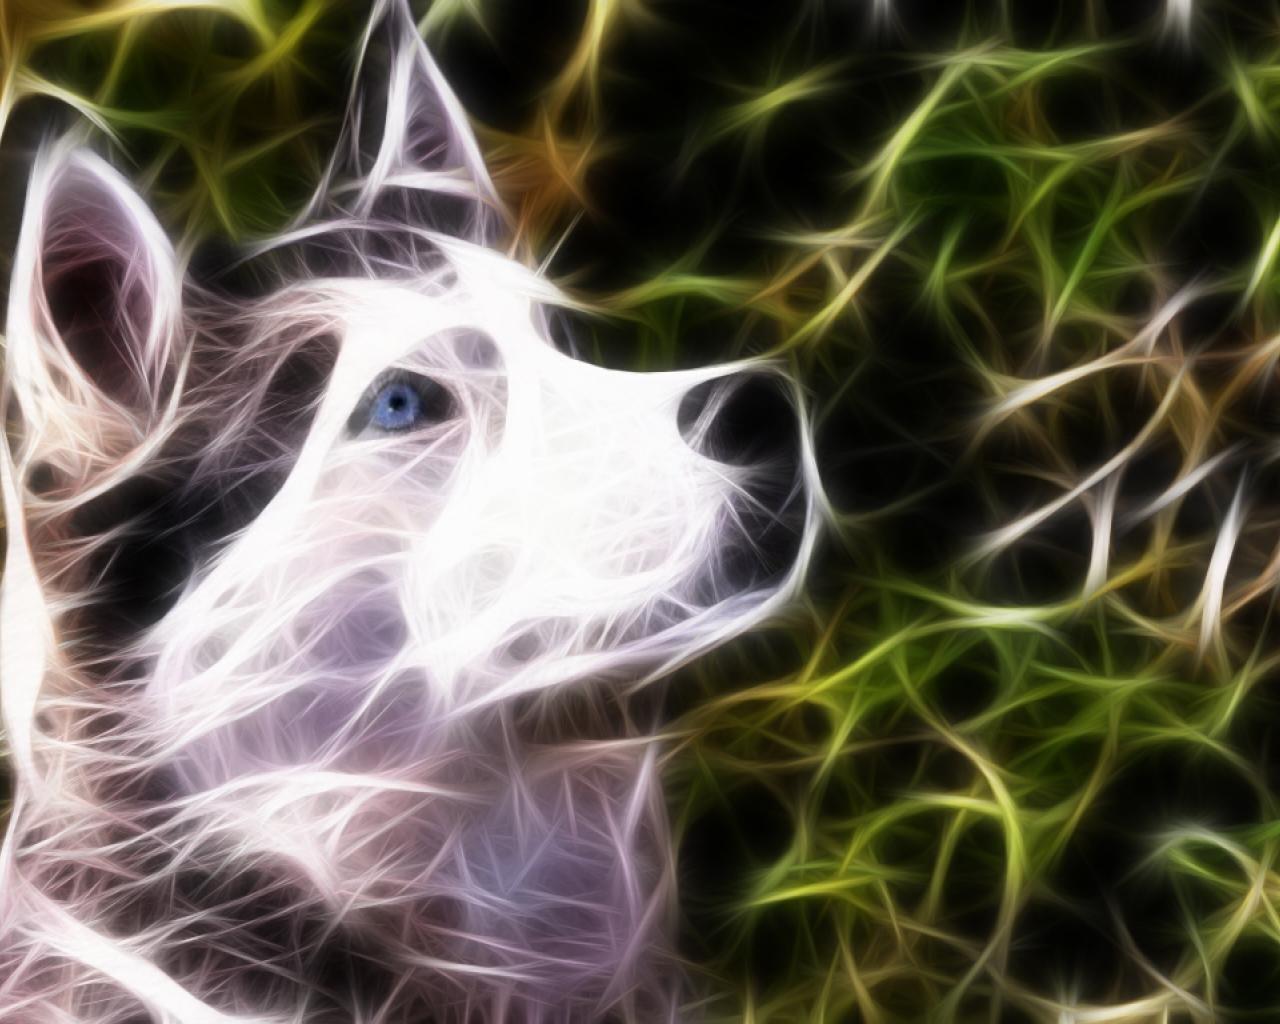 Cute Yoda Wallpaper Siberian Husky Wallpapers Hd For Desktop Backgrounds